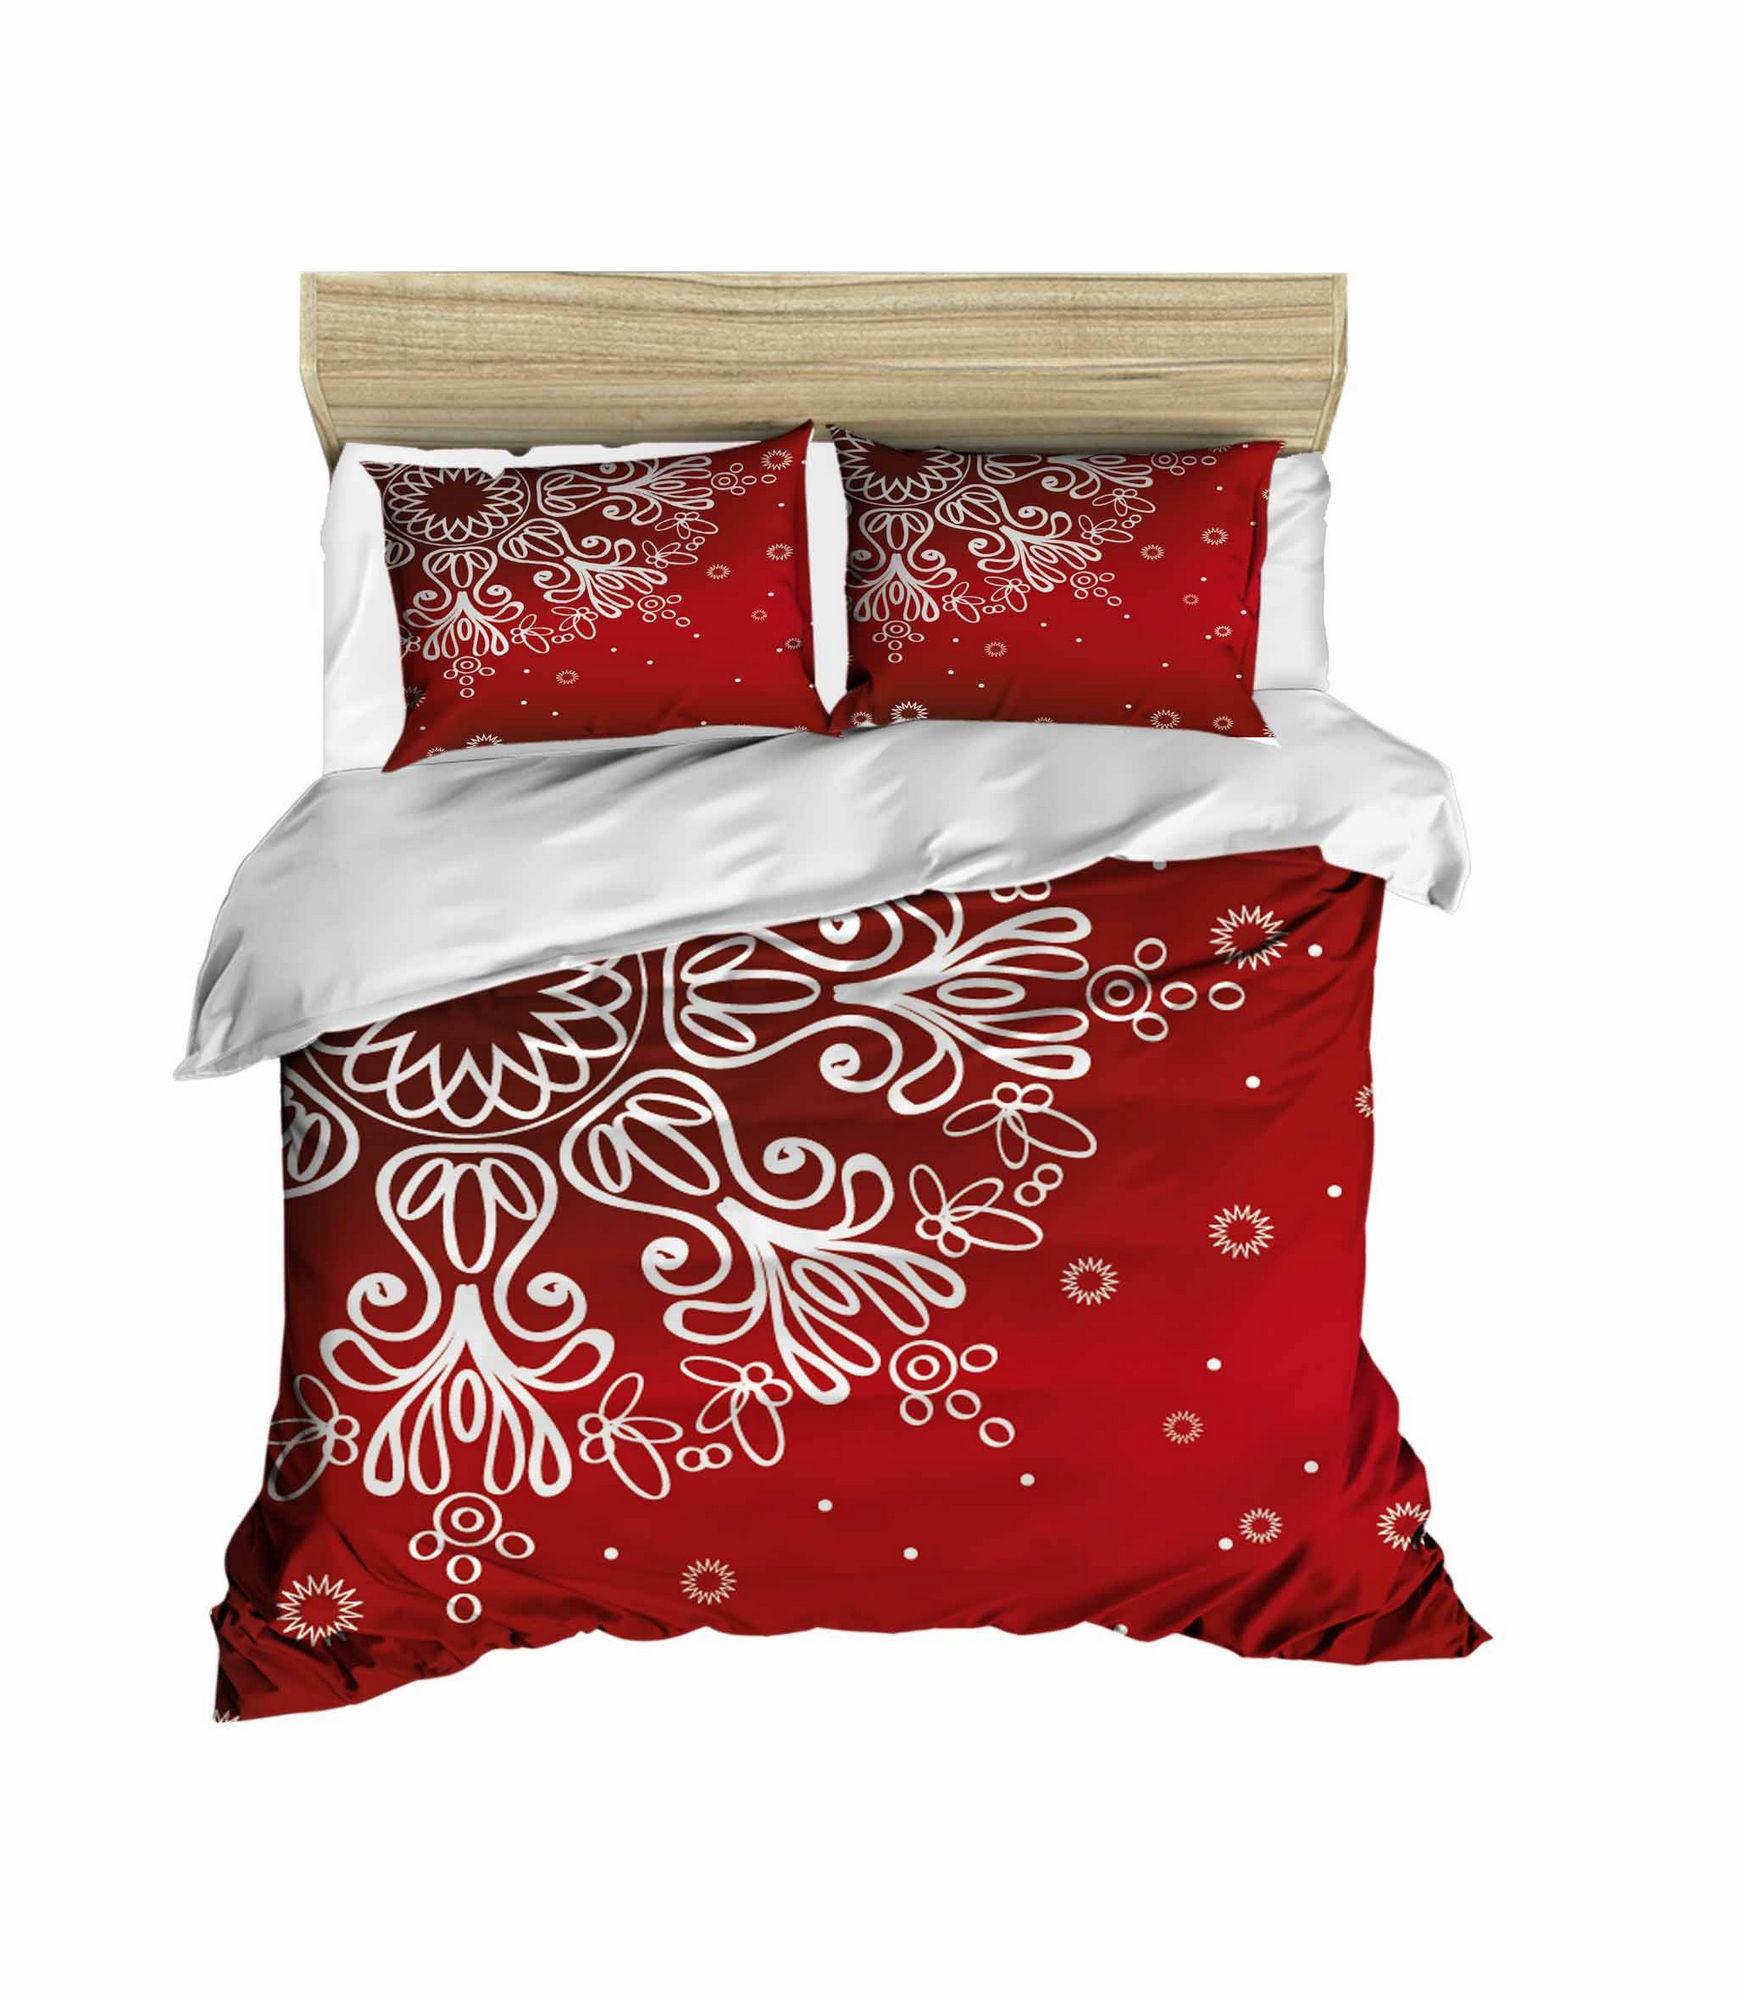 Lenjerie de pat din bumbac si microfibra Christmas 427 Rosu / Alb, 200 x 220 cm